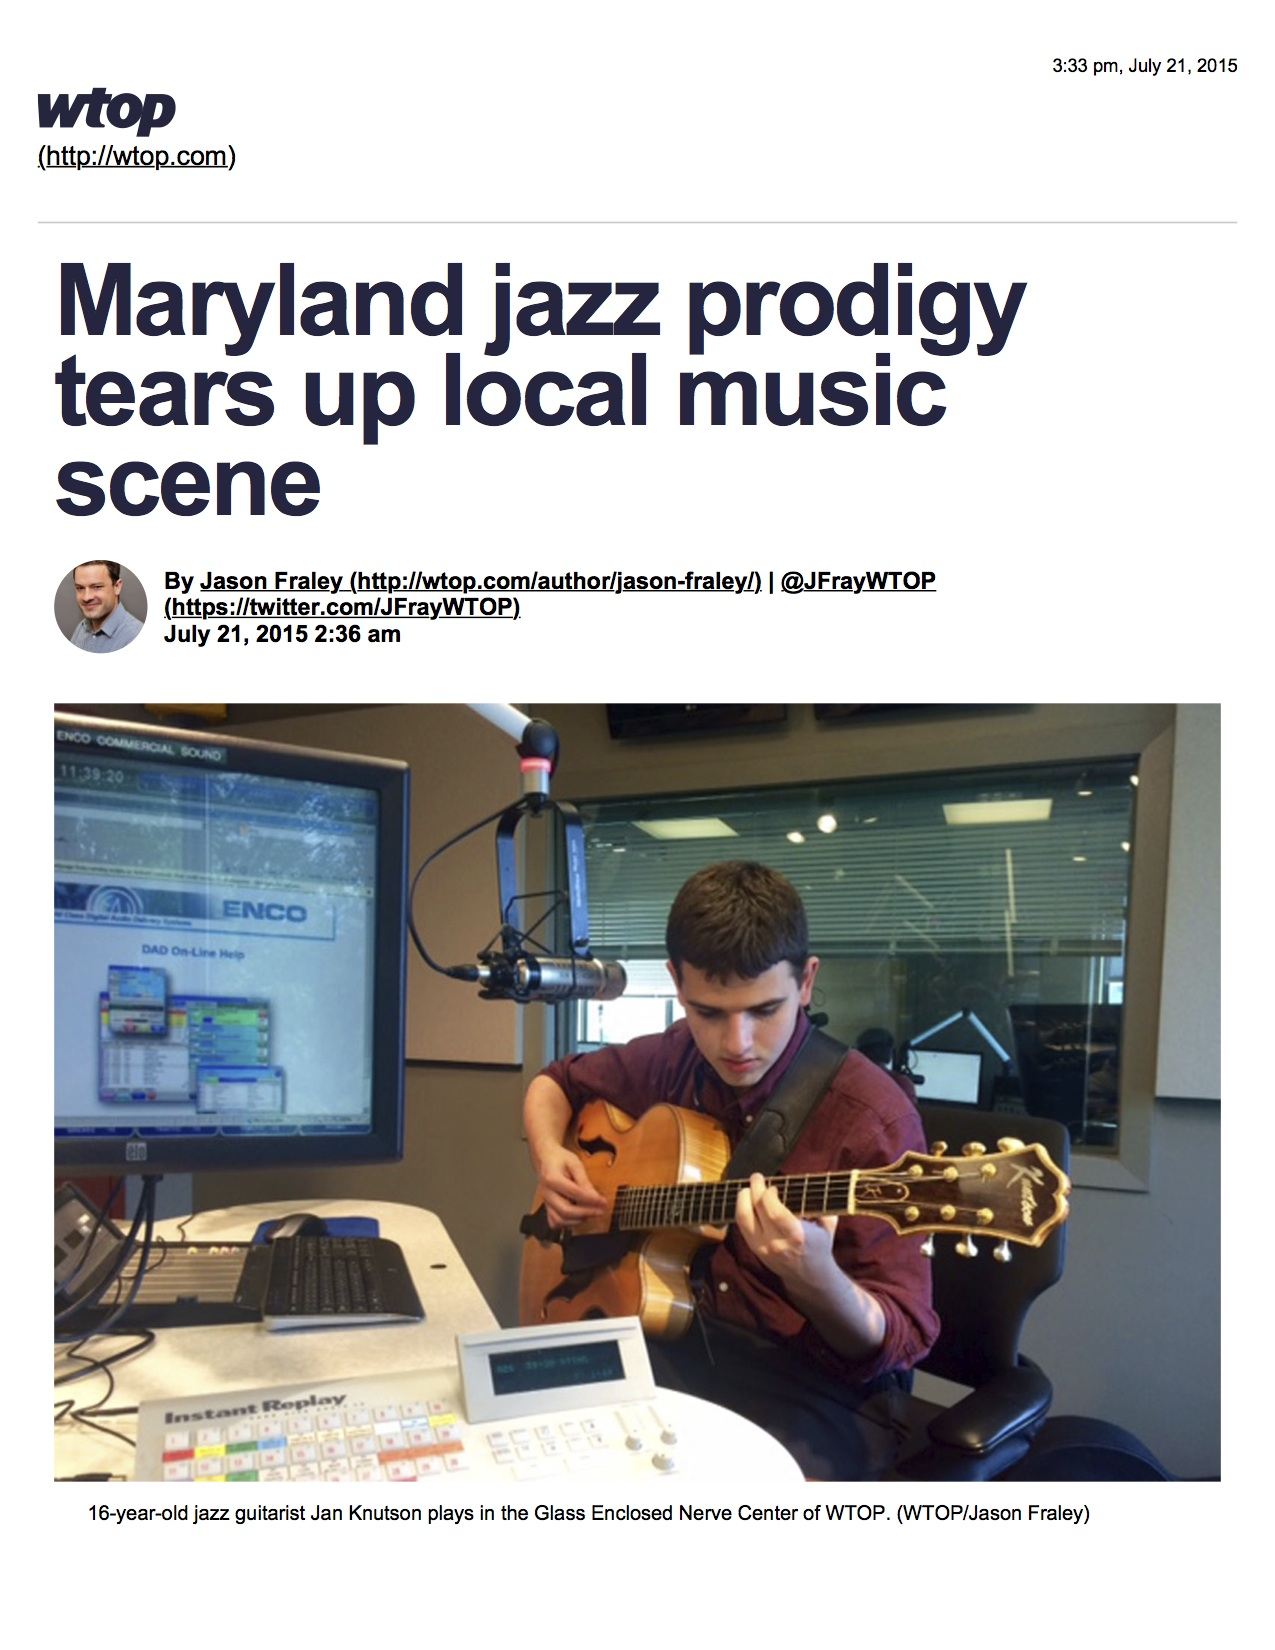 Maryland jazz prodigy tears up local music scene - WTOP.jpg